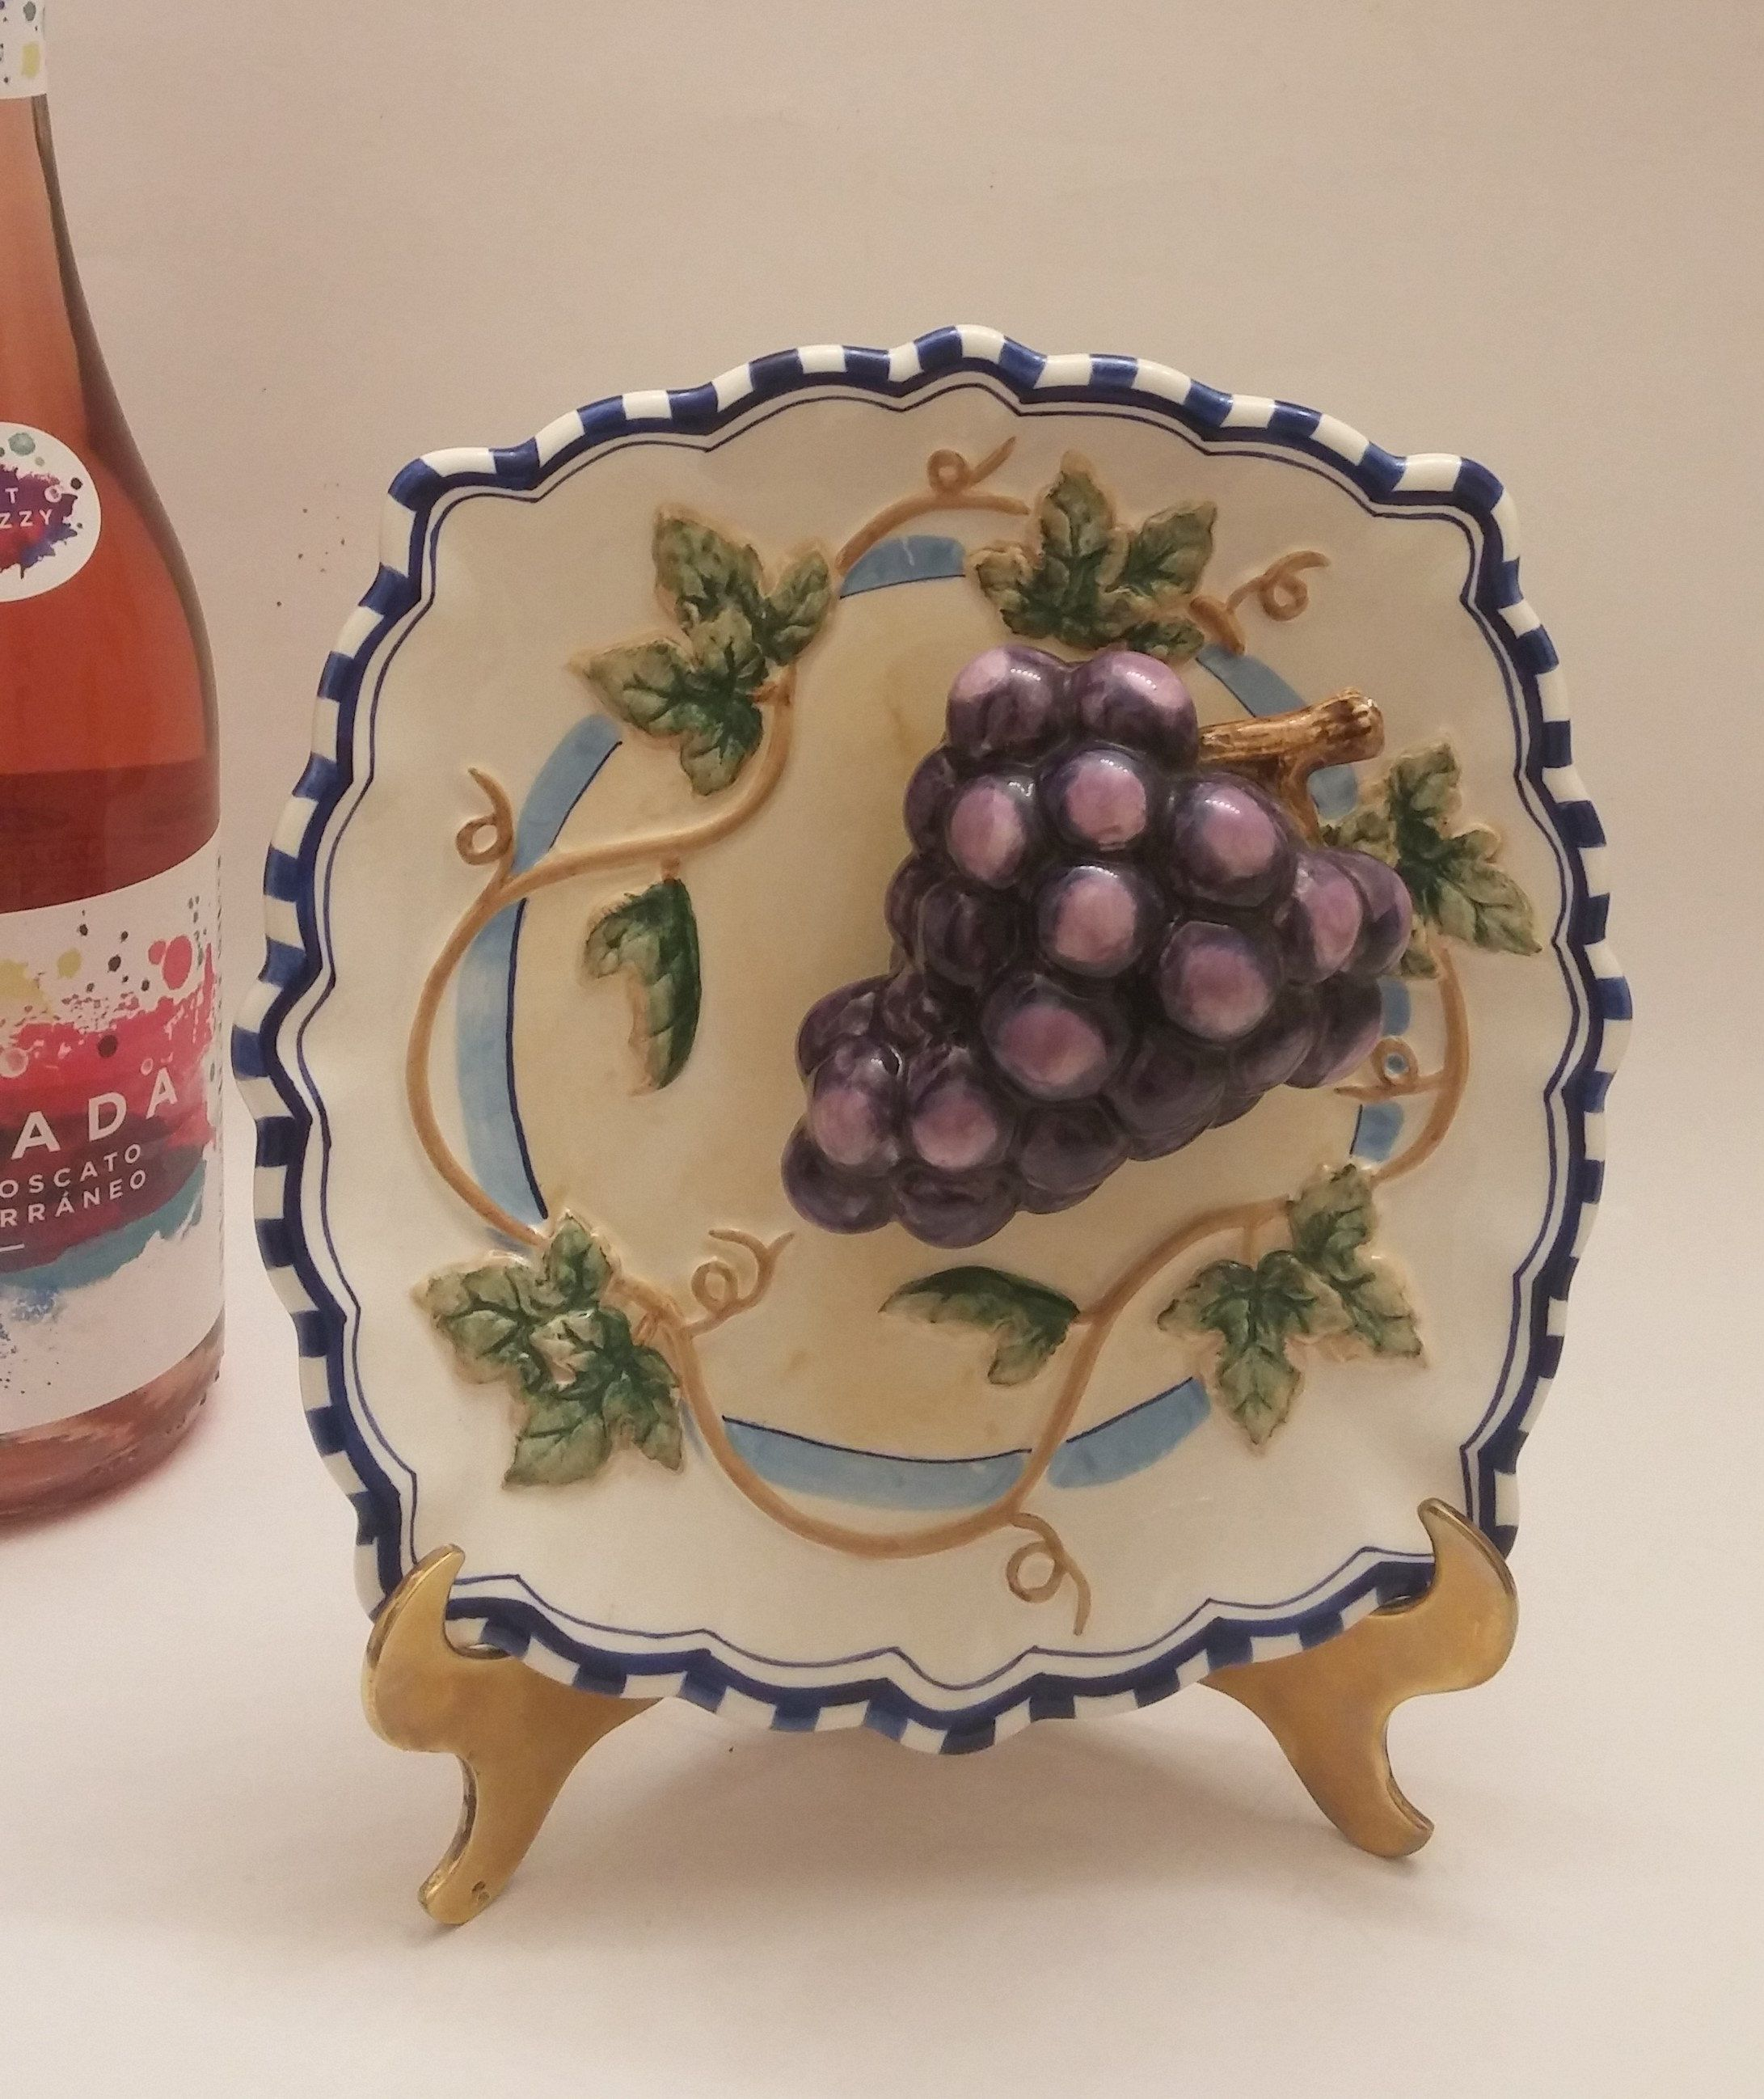 Vintage Bella Casa By Ganz 8 Inch Decorative Plate G Wall Hanging Fruit Grape Millysattictreasures On Etsy